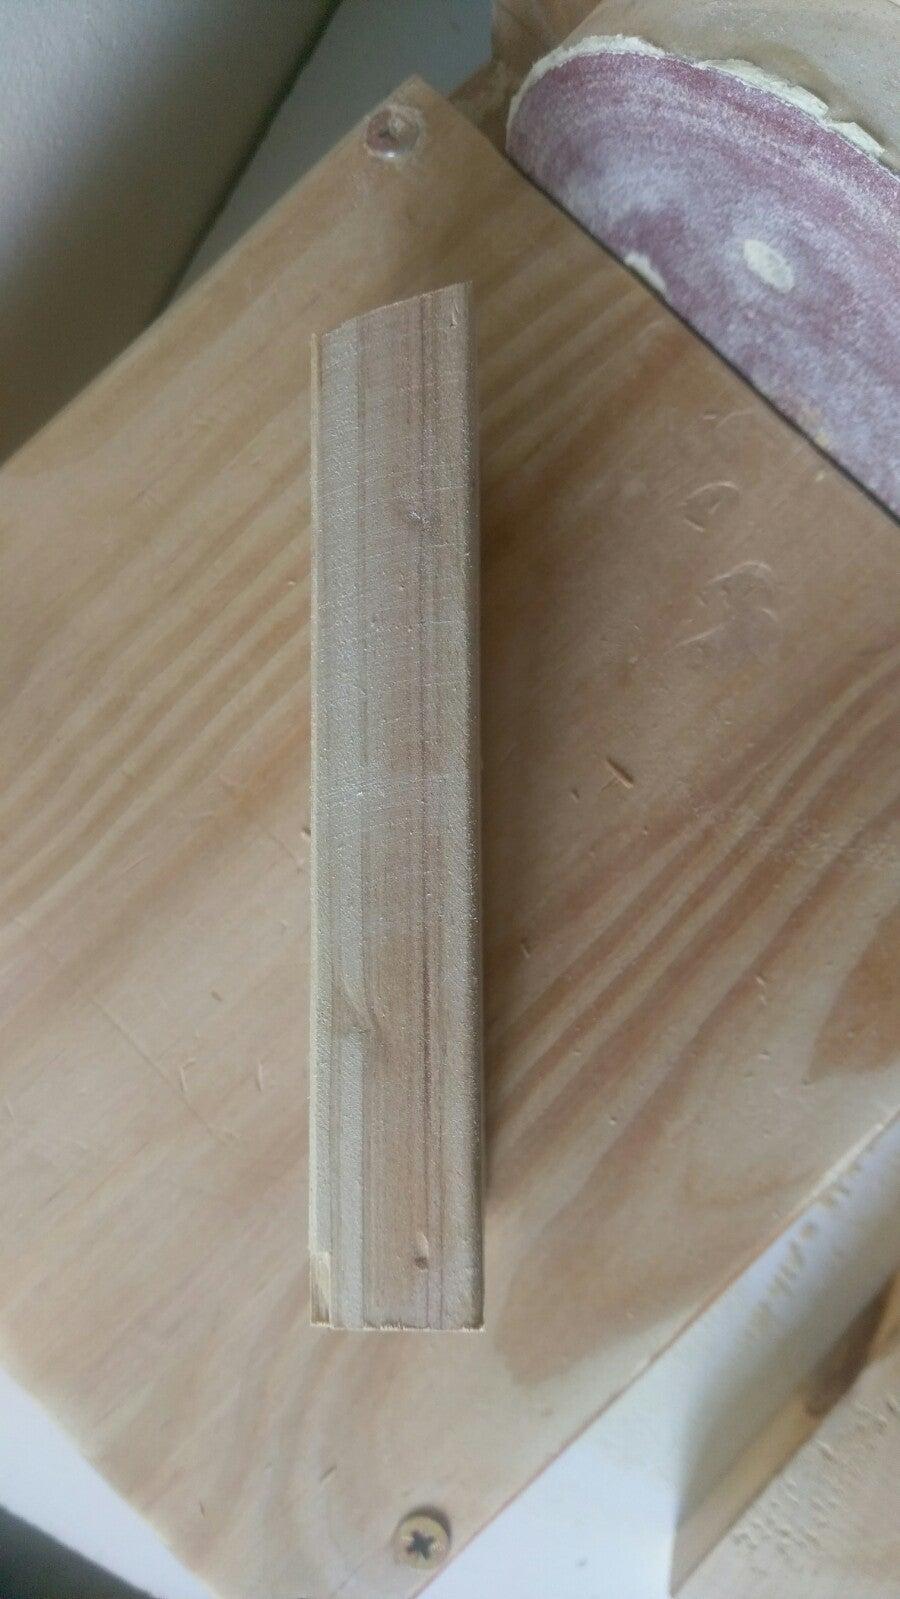 Step 2 - Sanding